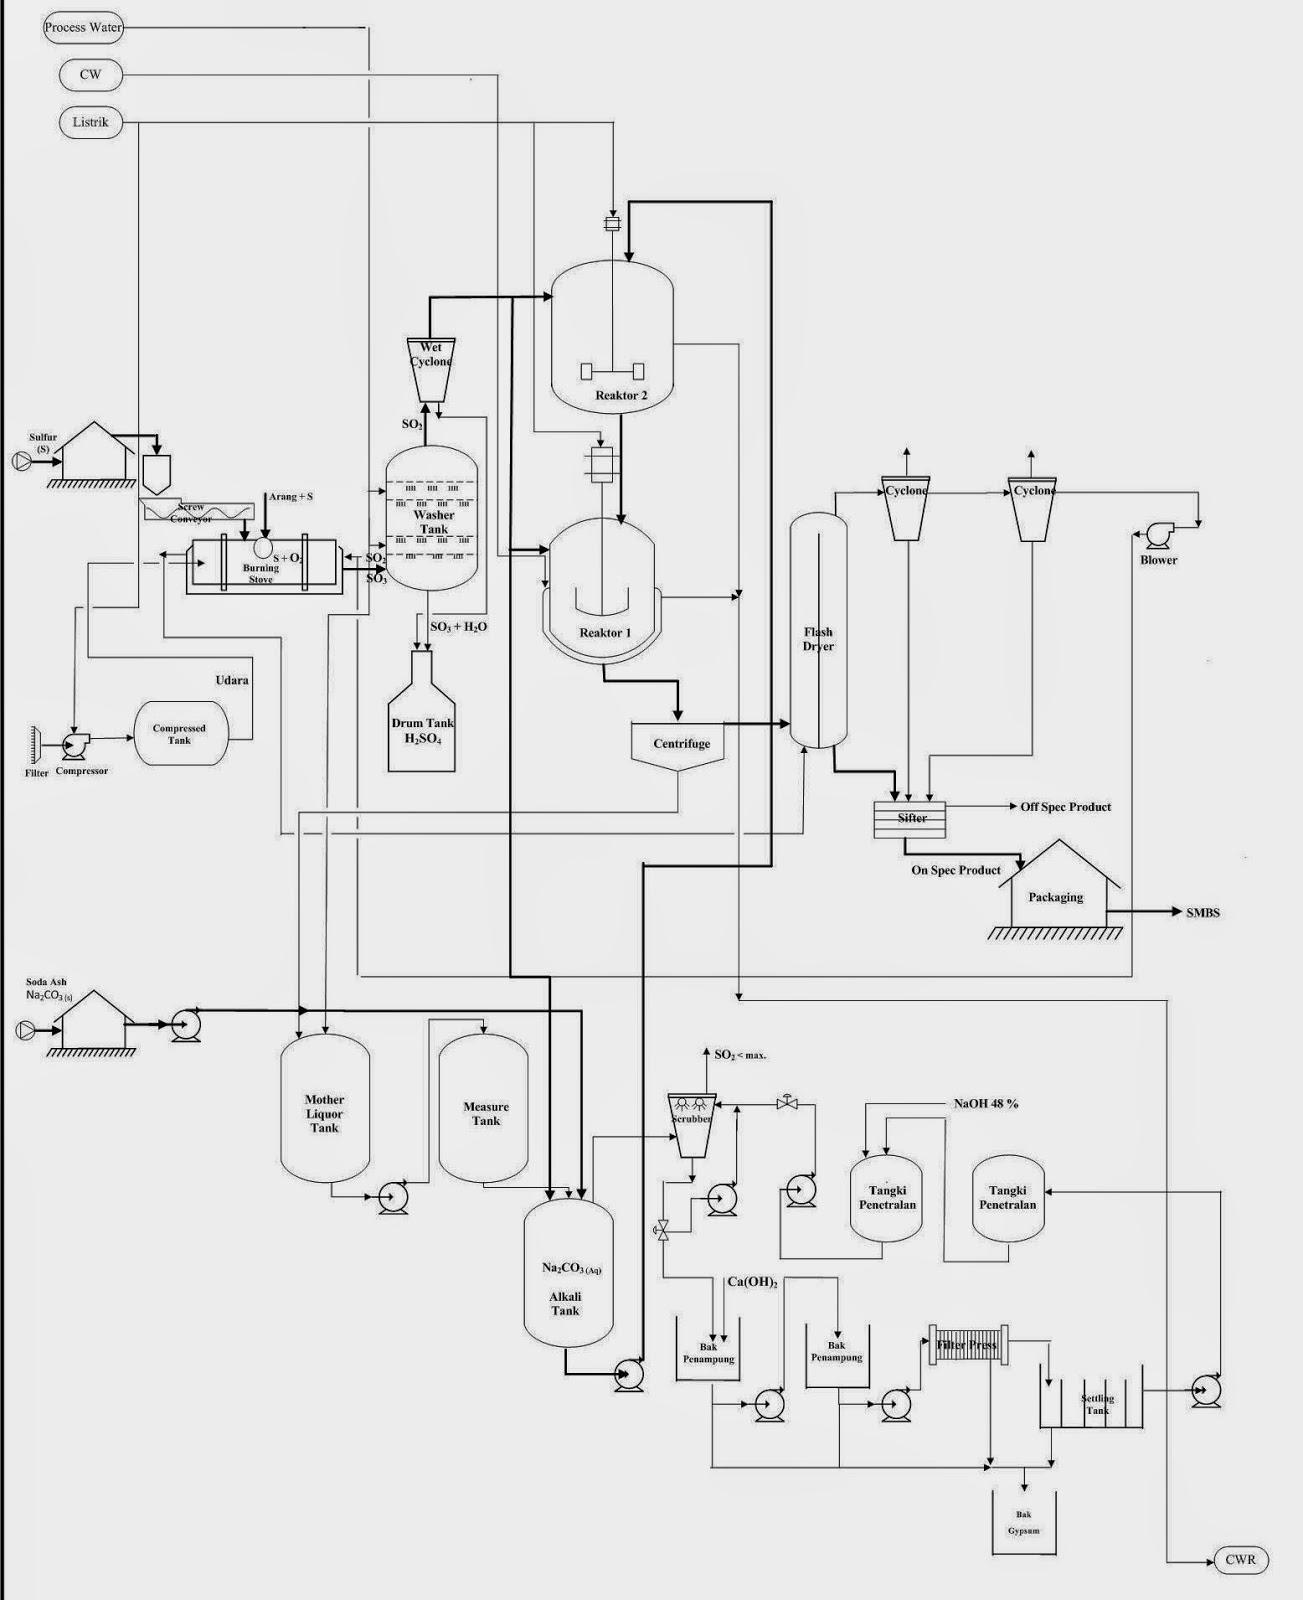 Mengenal Lebih Dalam Teknik Kimia Amp Manajemen Teknologi Proses Pembuatan S Dium M Tabisulphite